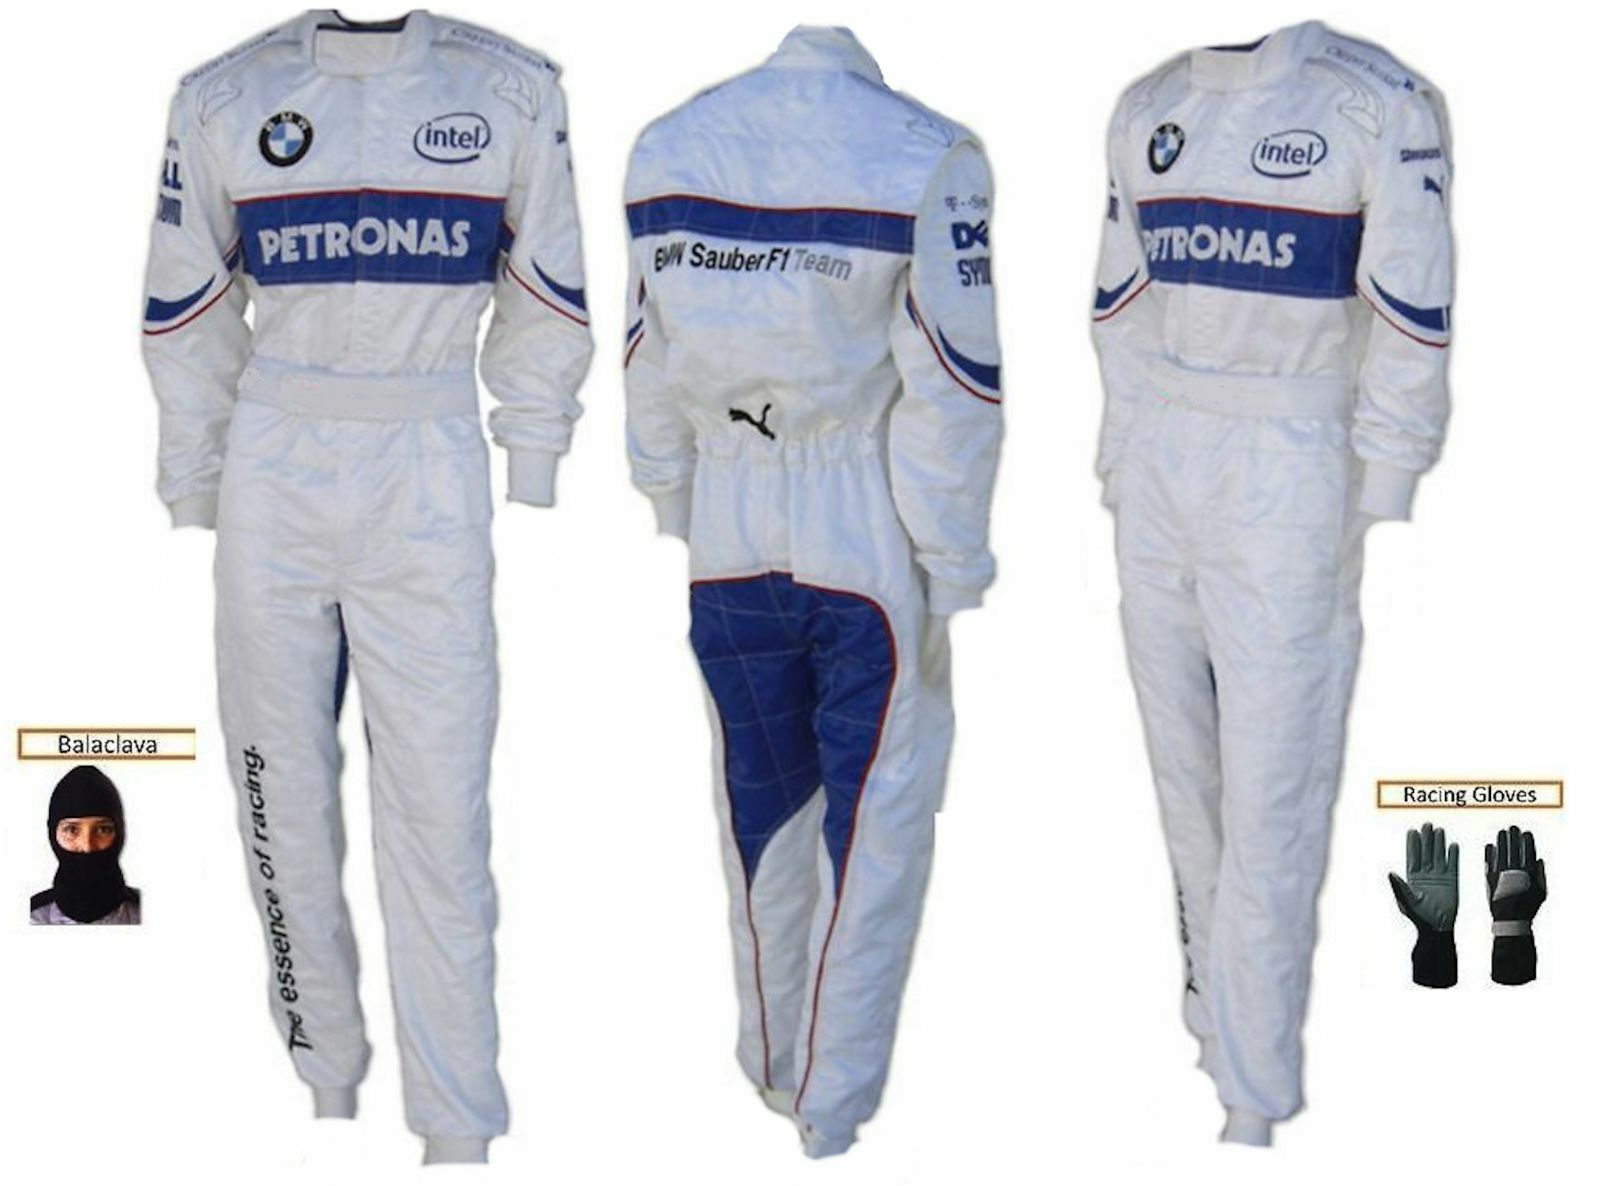 BMW petronas kart race CIK FIA level 2 suit (free gifts)